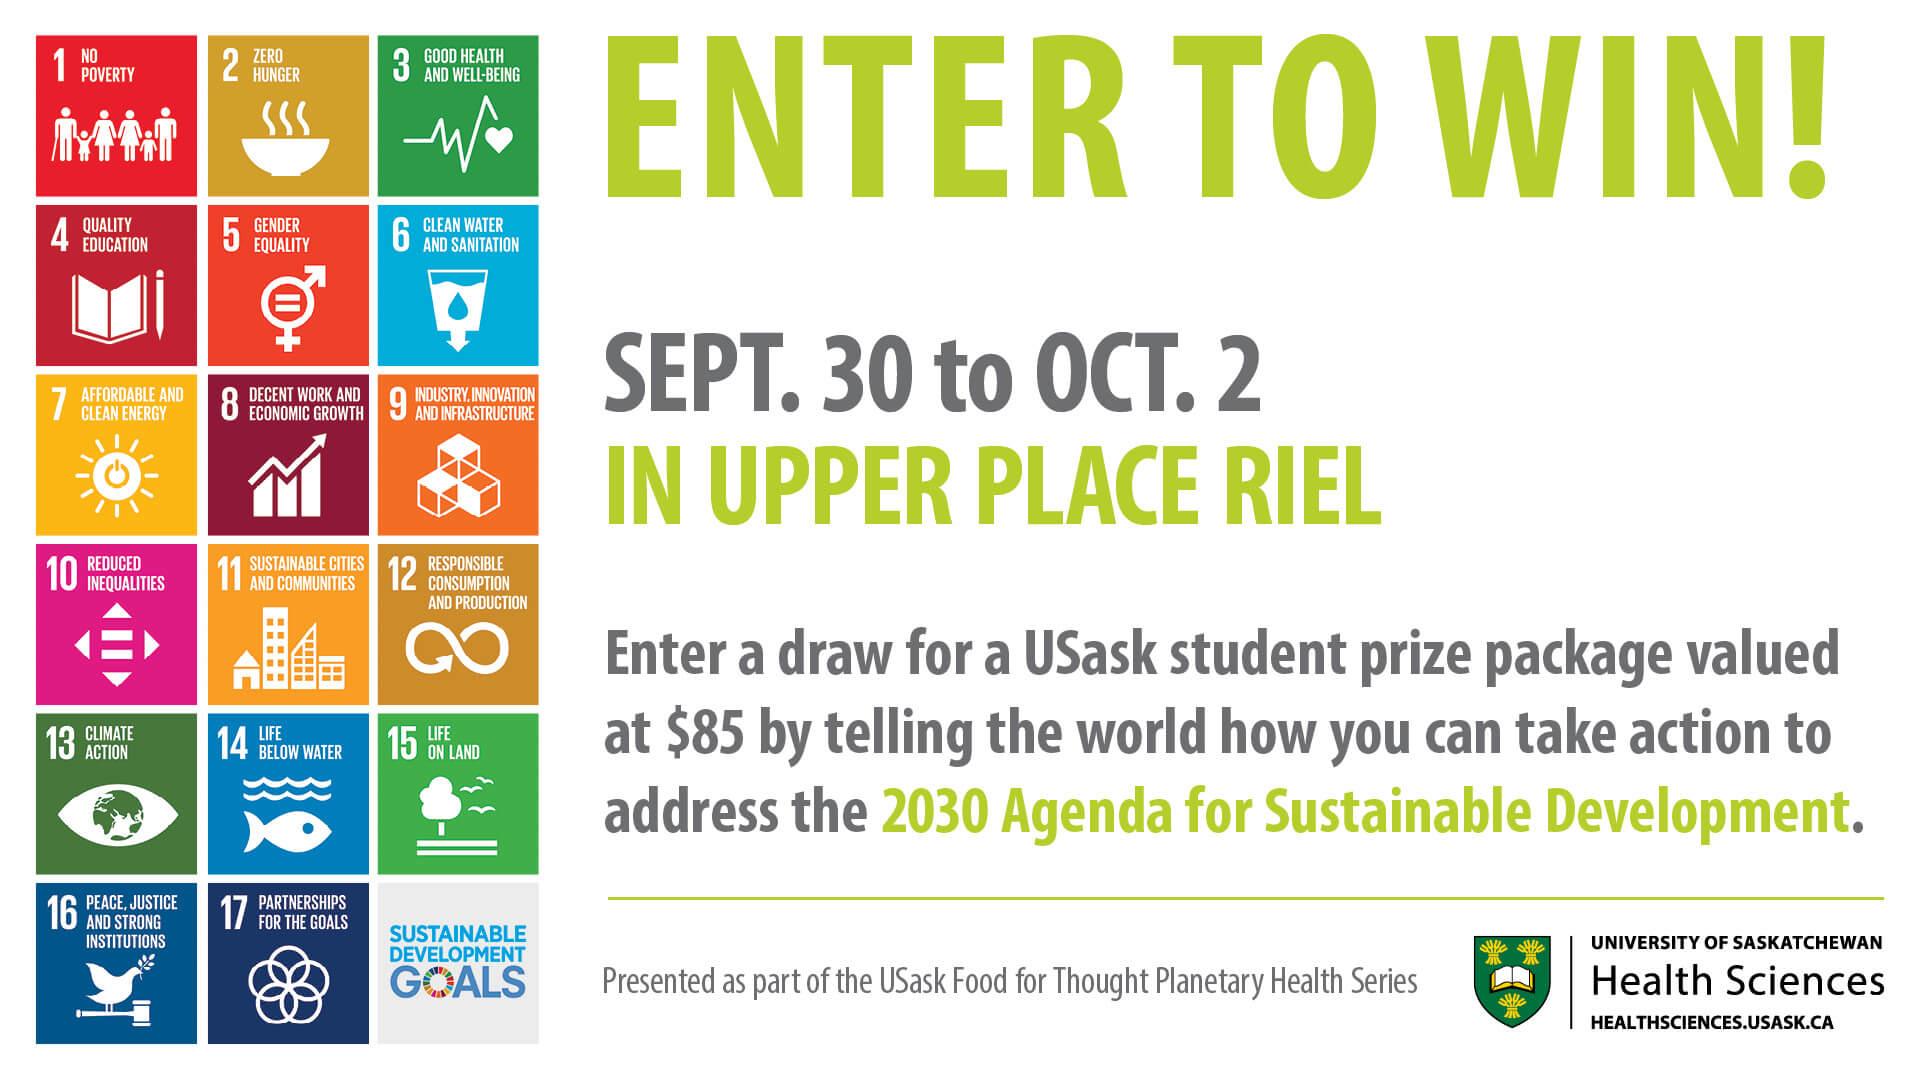 SDG Awareness Sept 30 to Oct 2